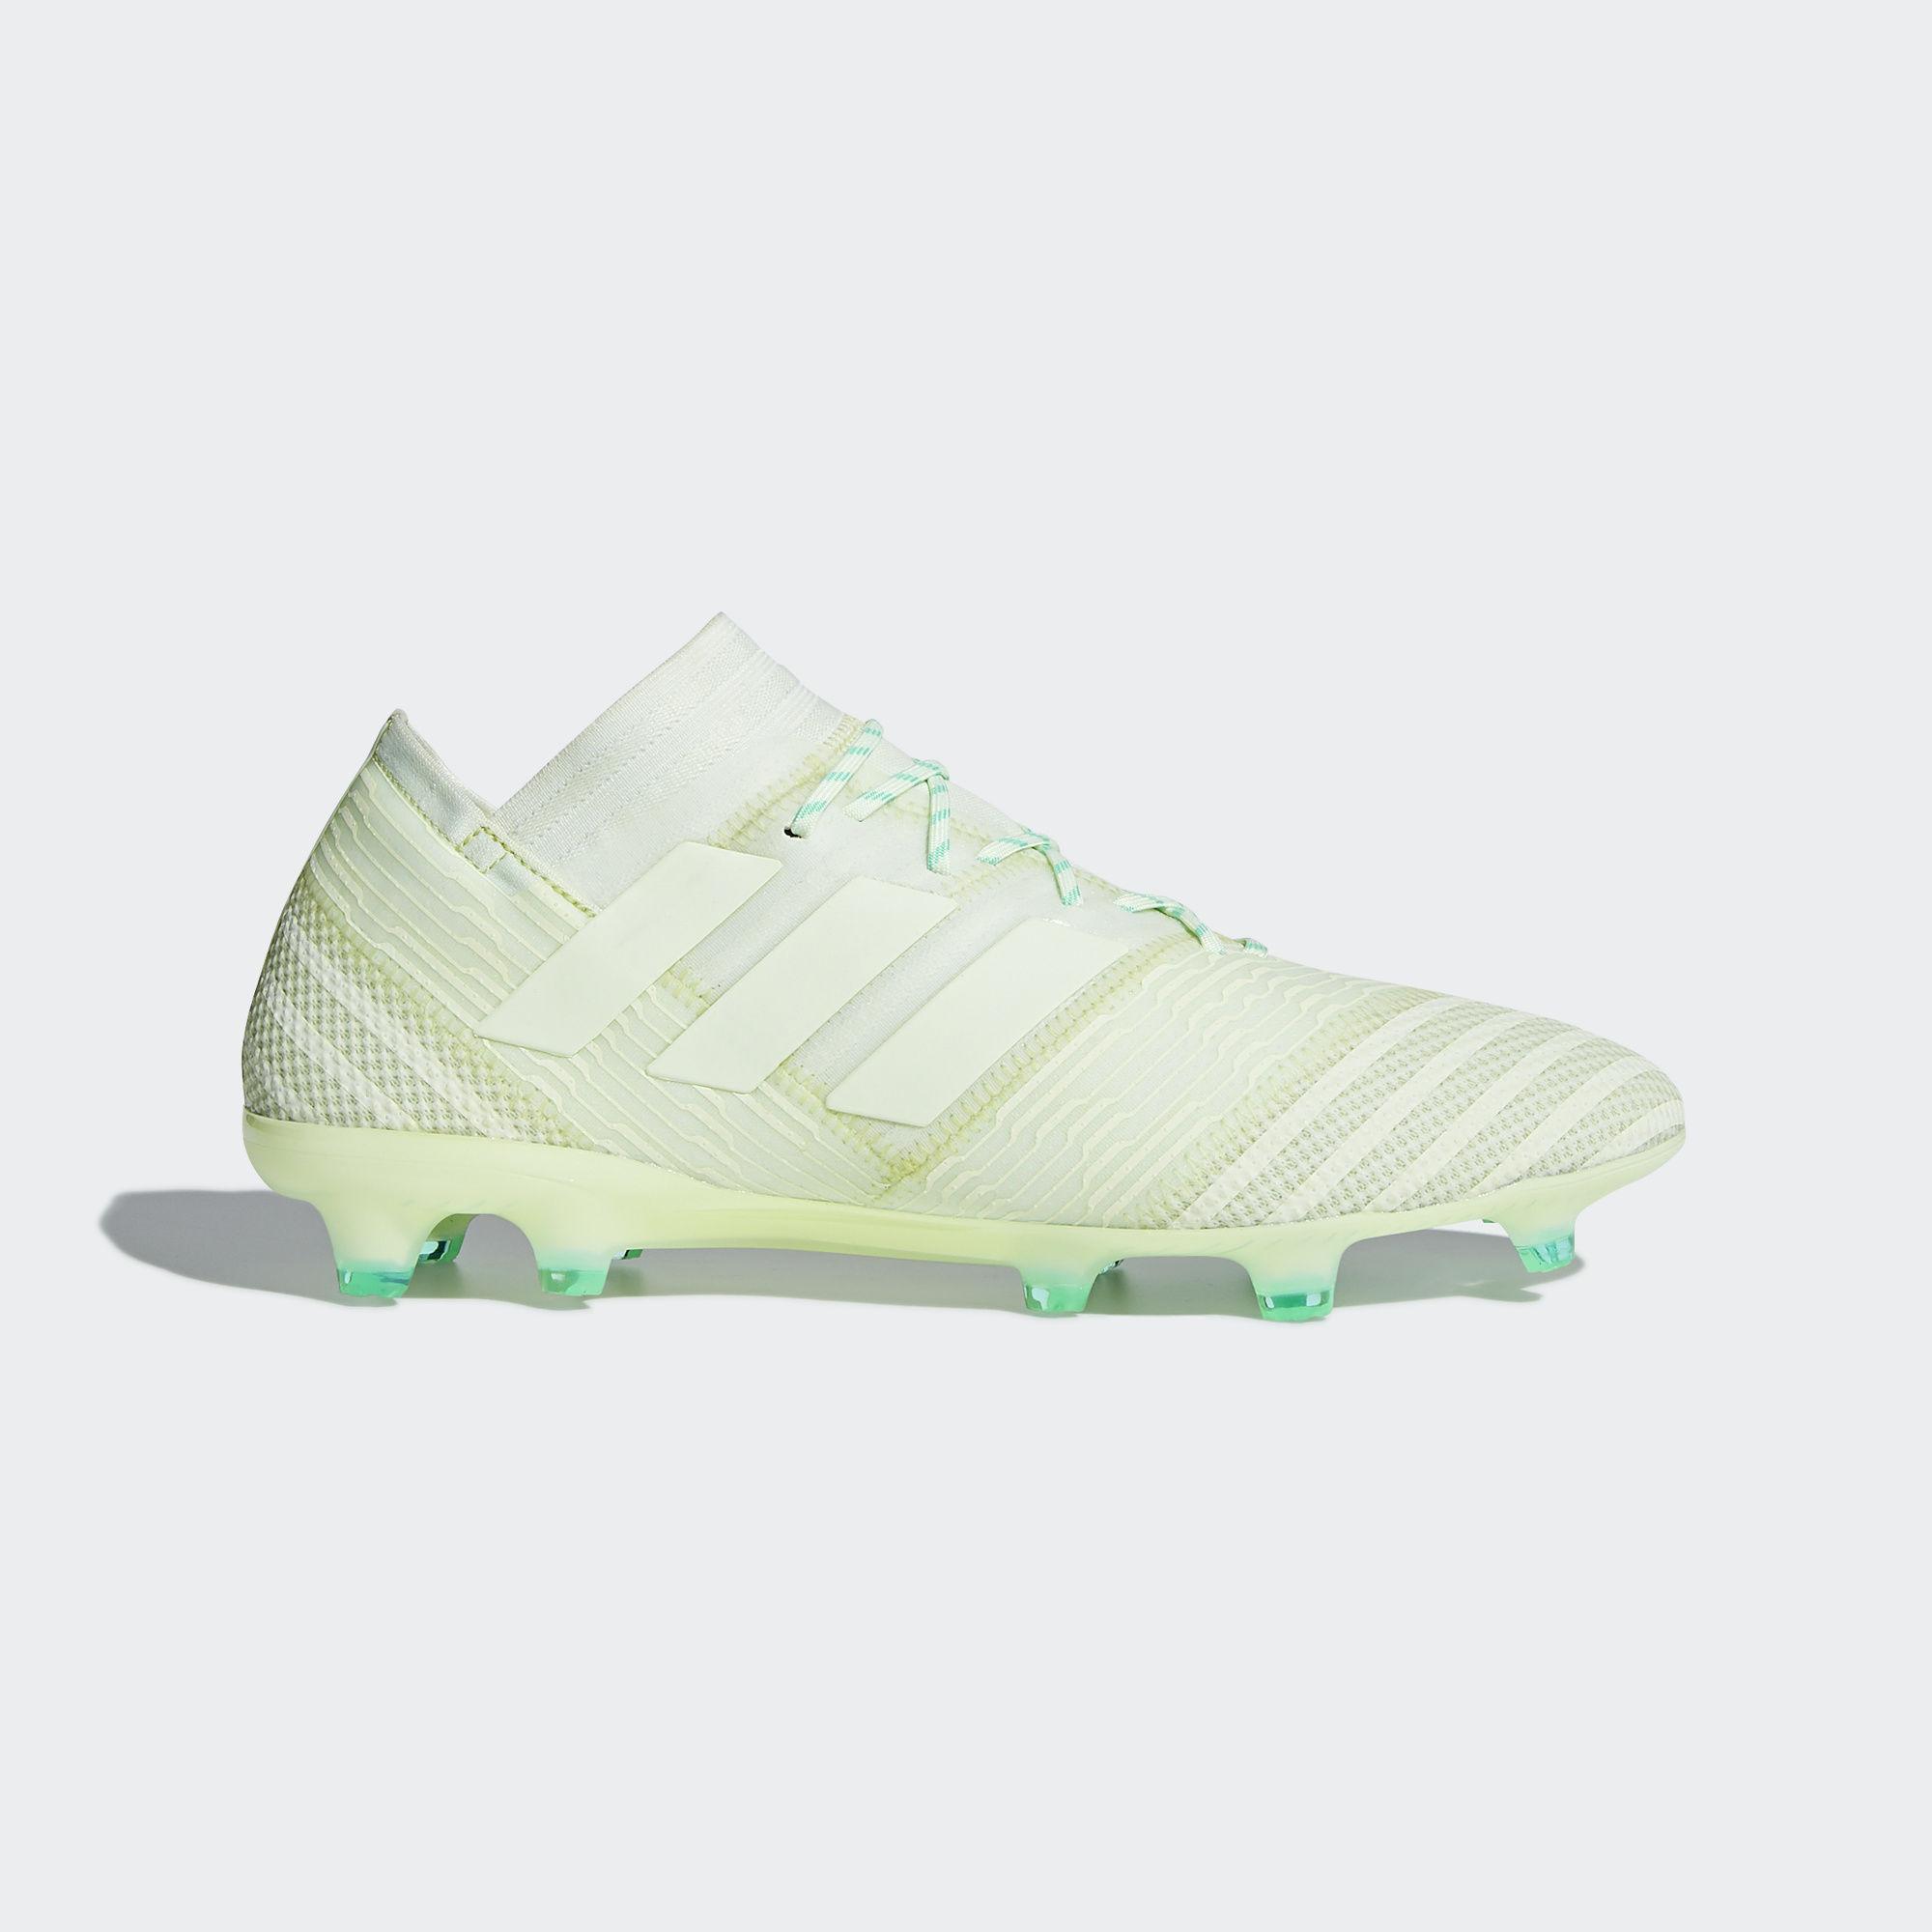 finest selection 974cc 2d857 adidas Nemeziz 17.1 FG - Green - Deadly Strike